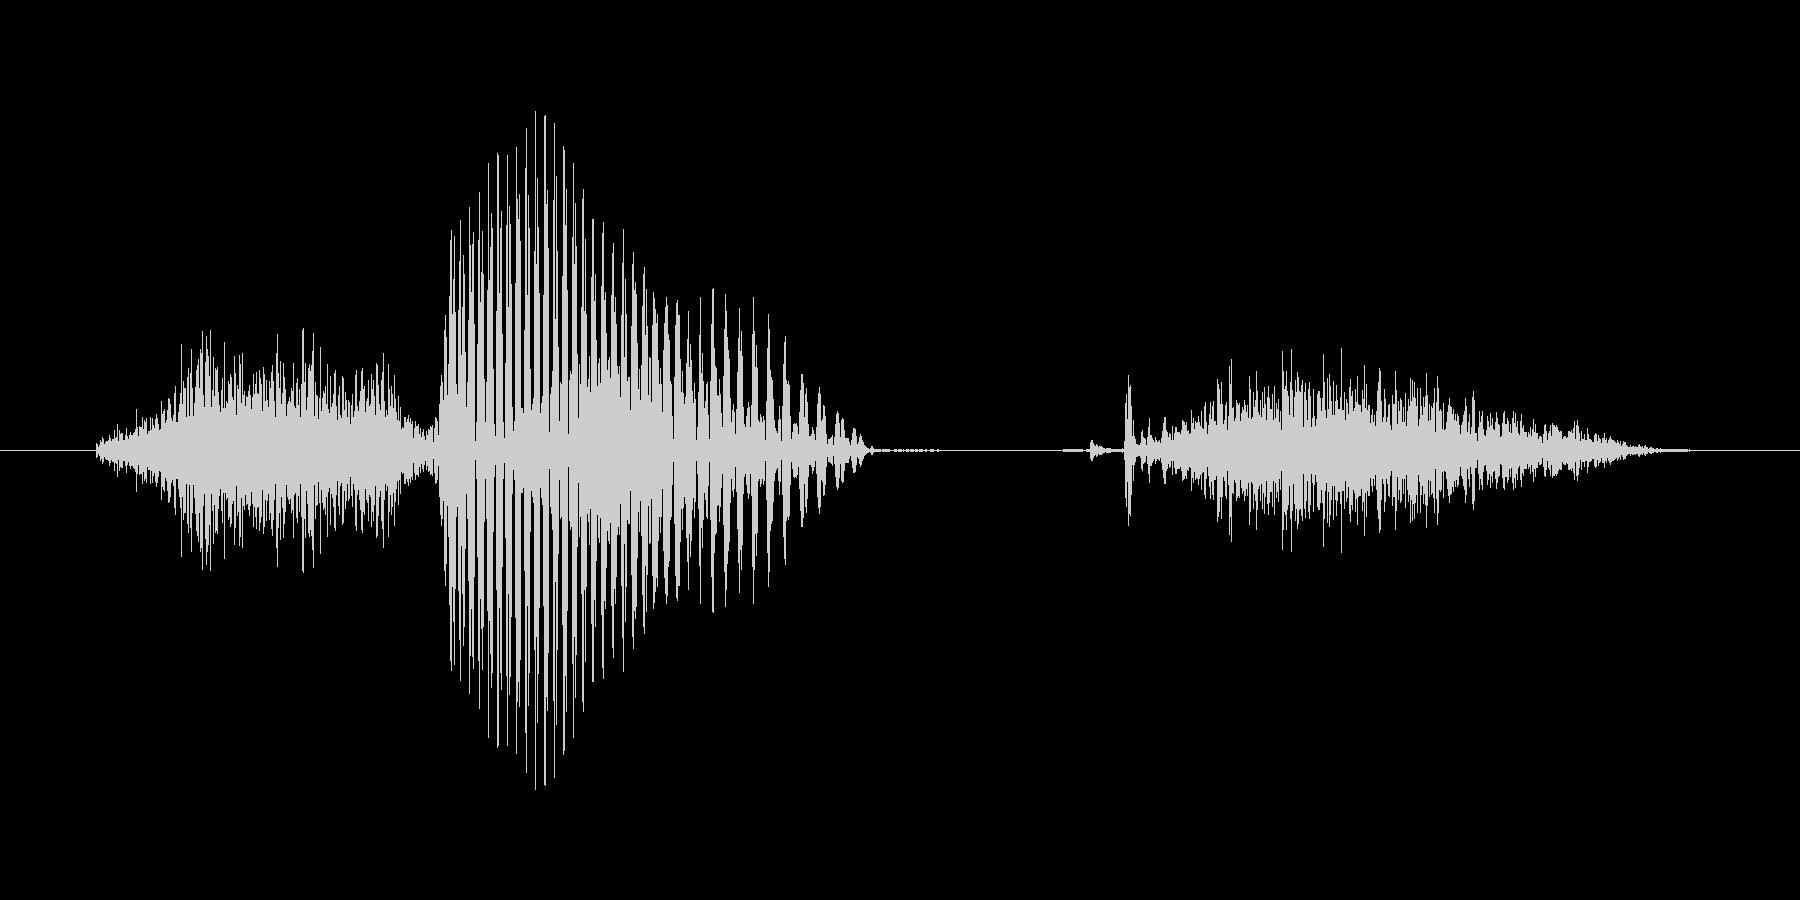 6 (six, 英語、米国女性声優K1)の未再生の波形